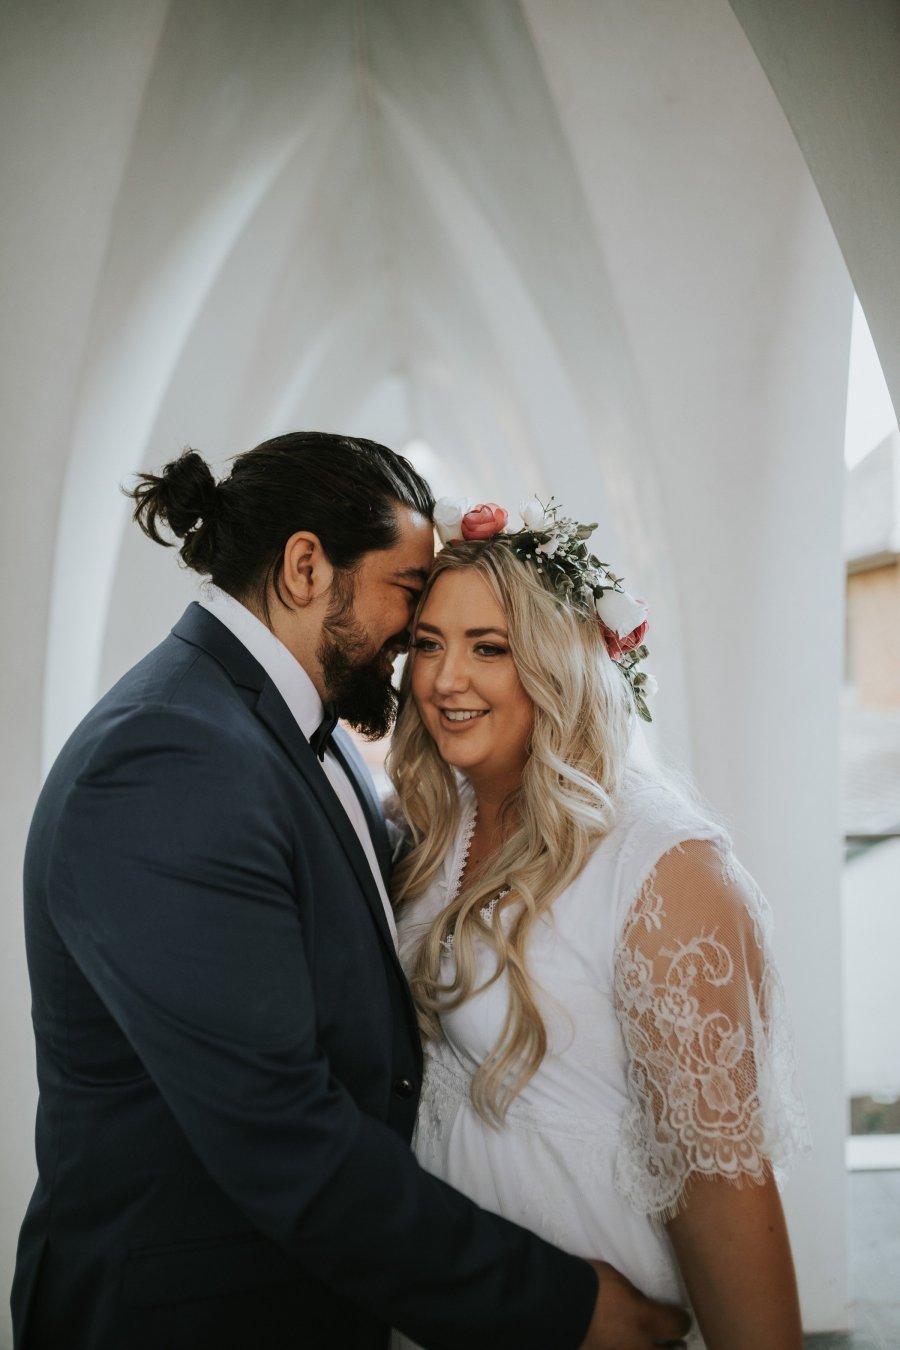 Ebony Blush Photography   Perth wedding Photographer   Perth City Farm Wedding   Imogen + Tristian116